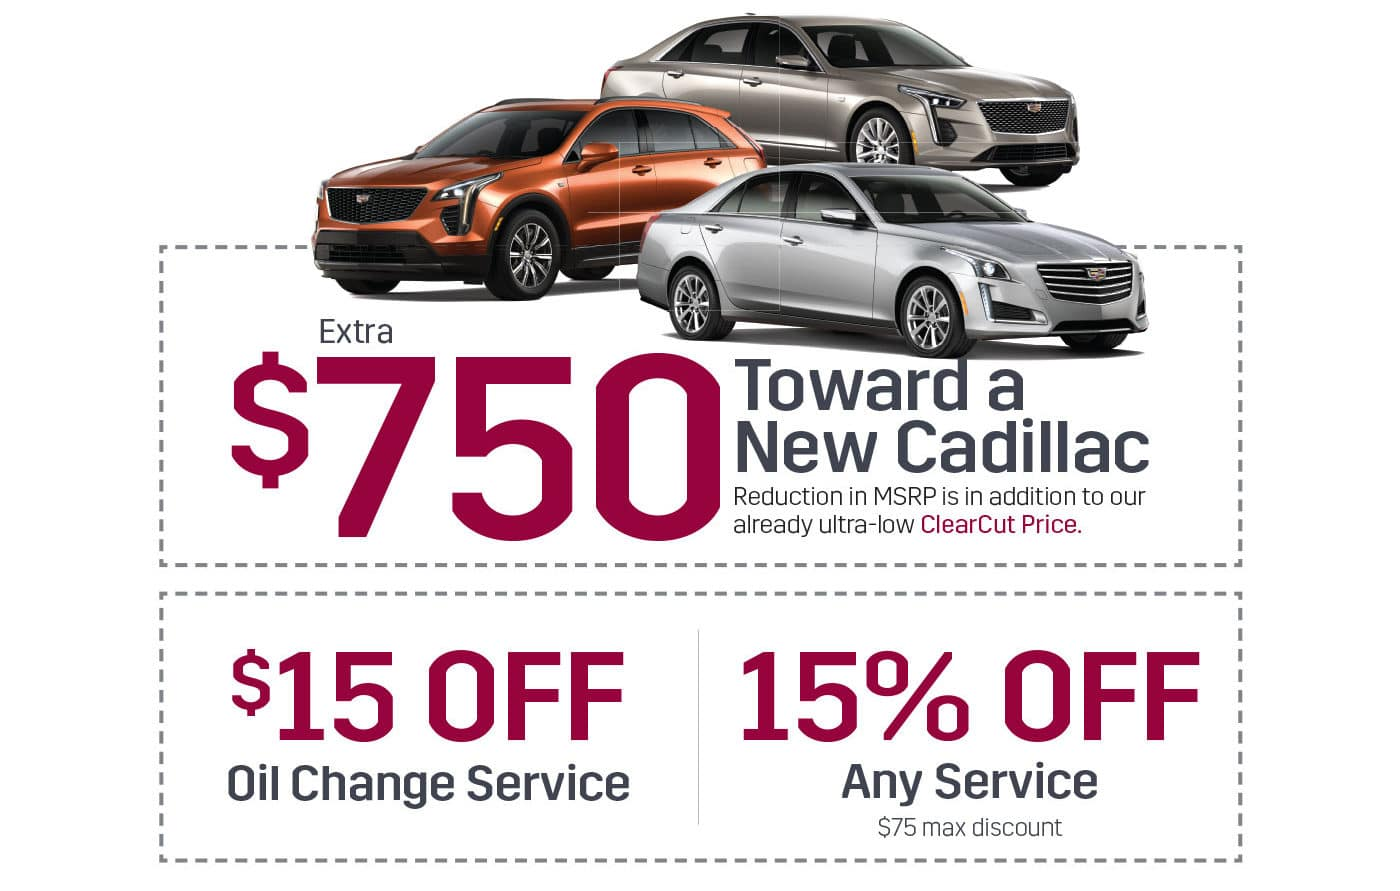 Cadillac Landing page coupons